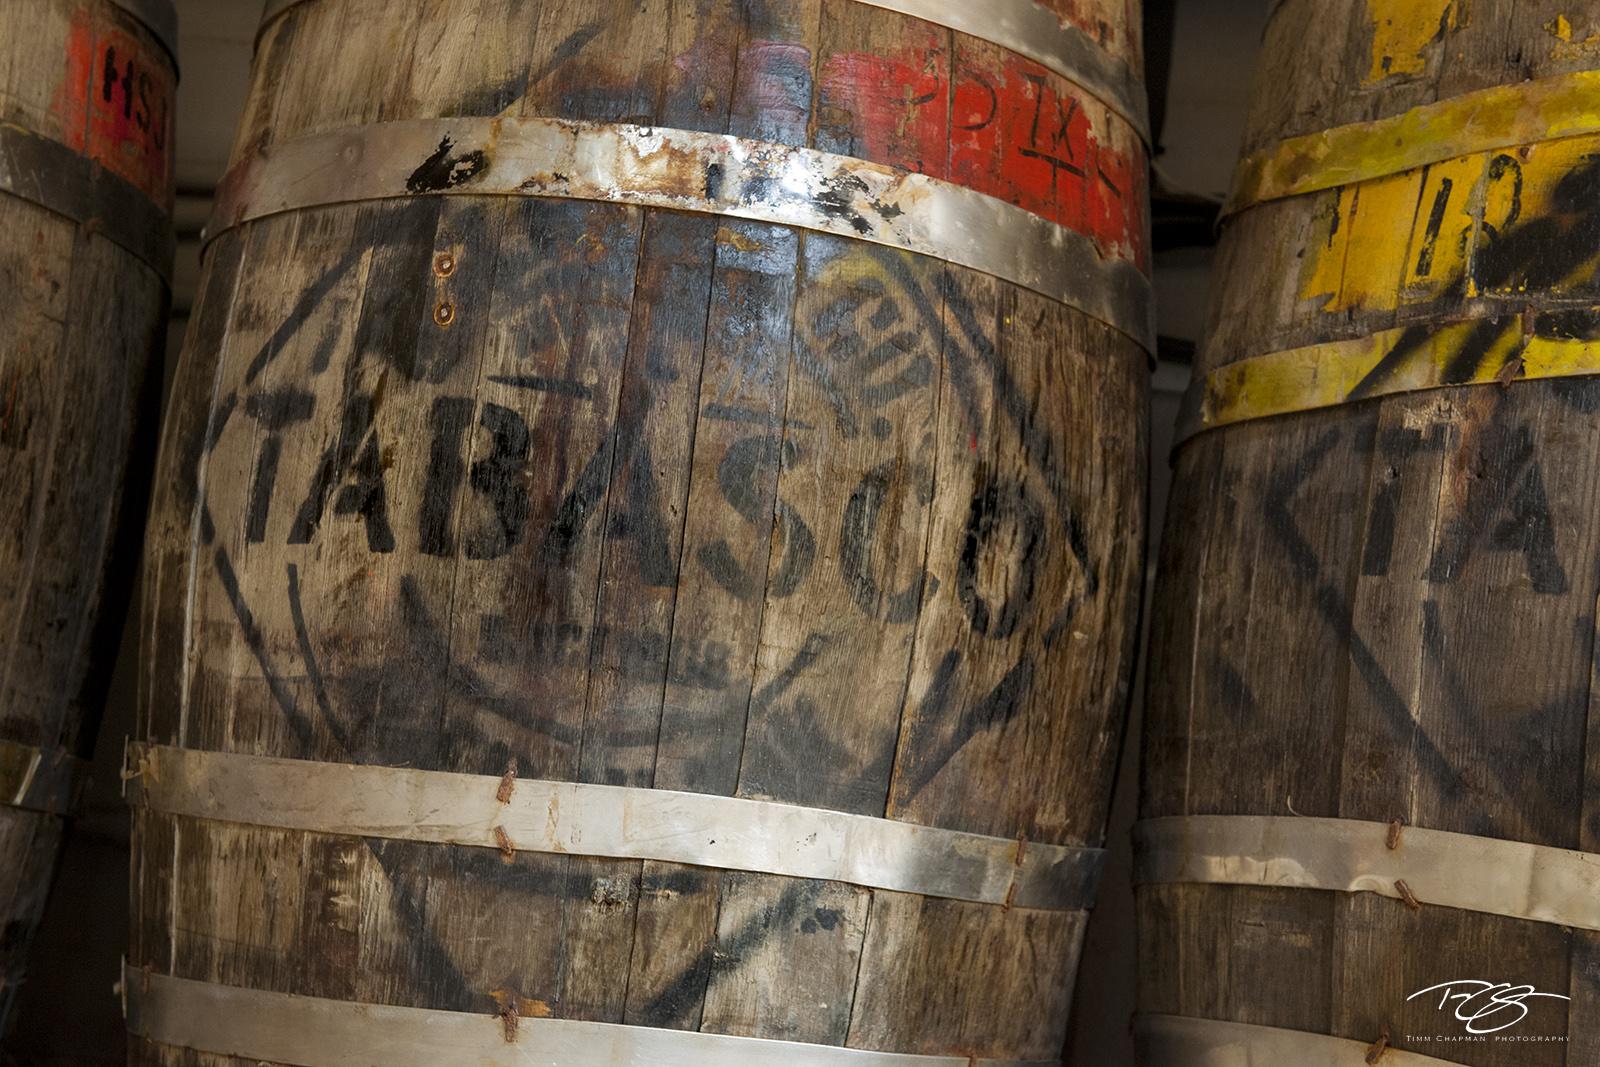 barrel, keg, louisiana, avery island, tabasco, tabasco sauce, peppers, mcilhenny, ferment, abstract, photo